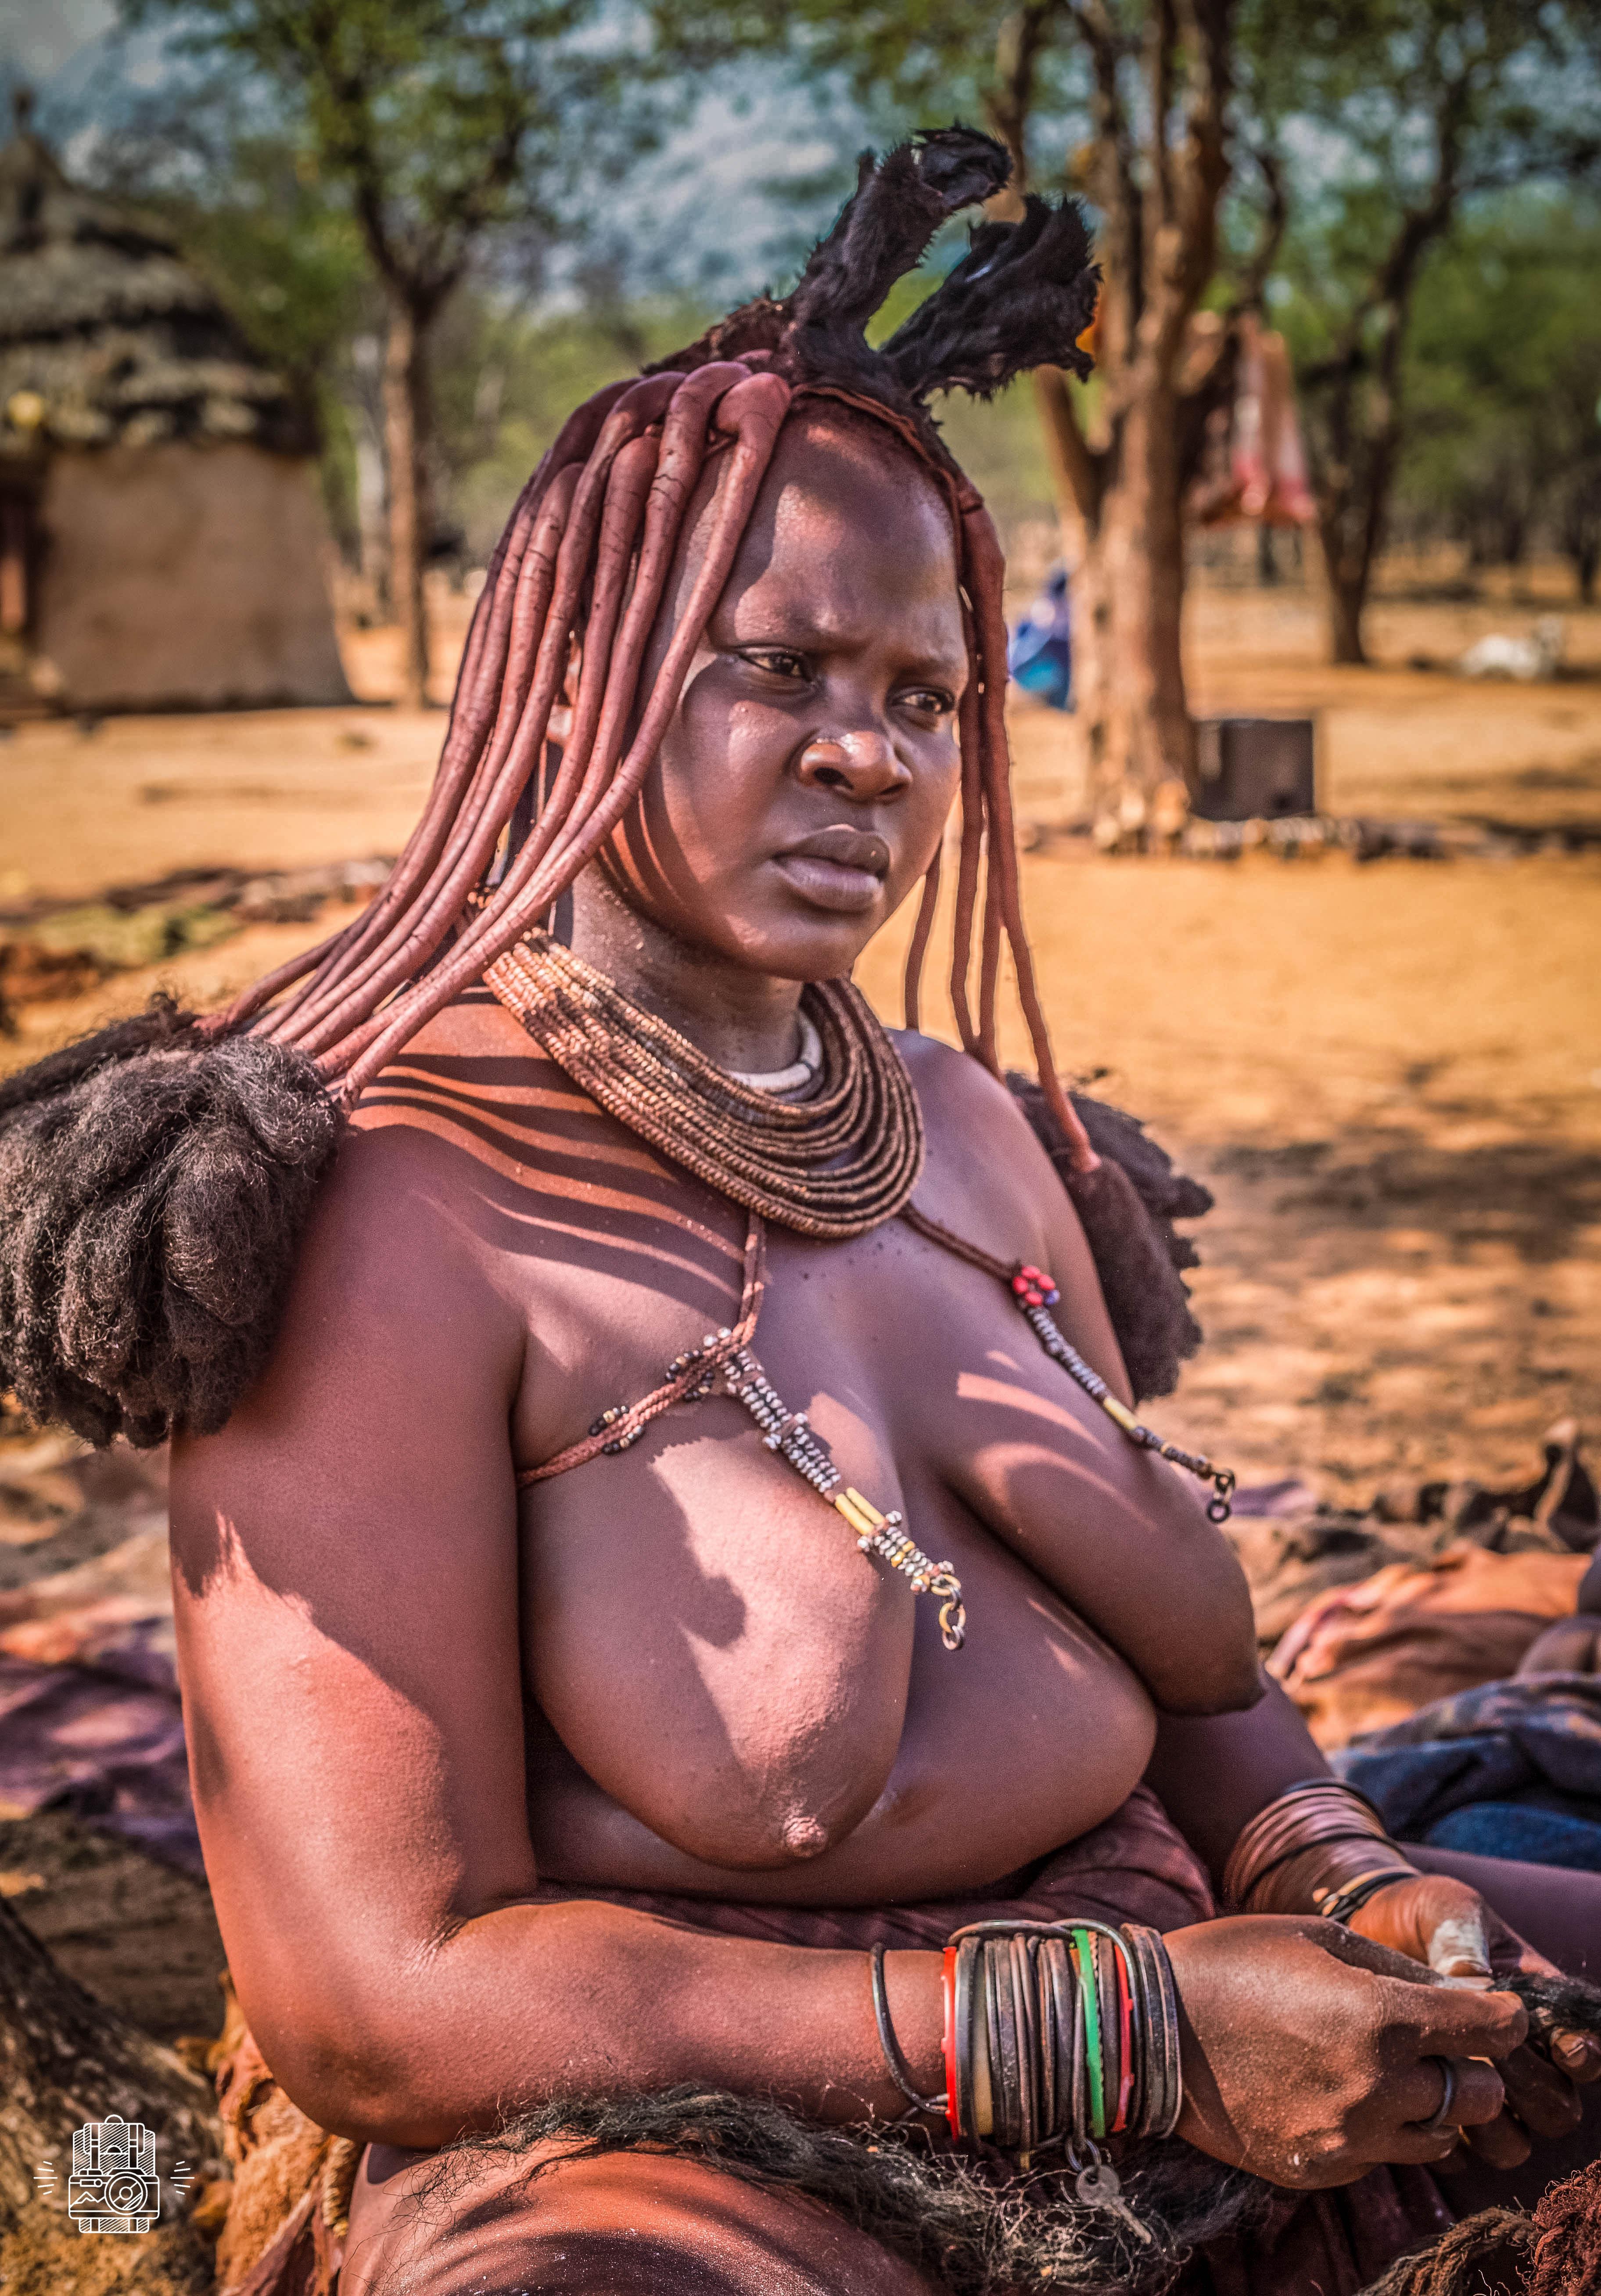 Namibie/Khorixax